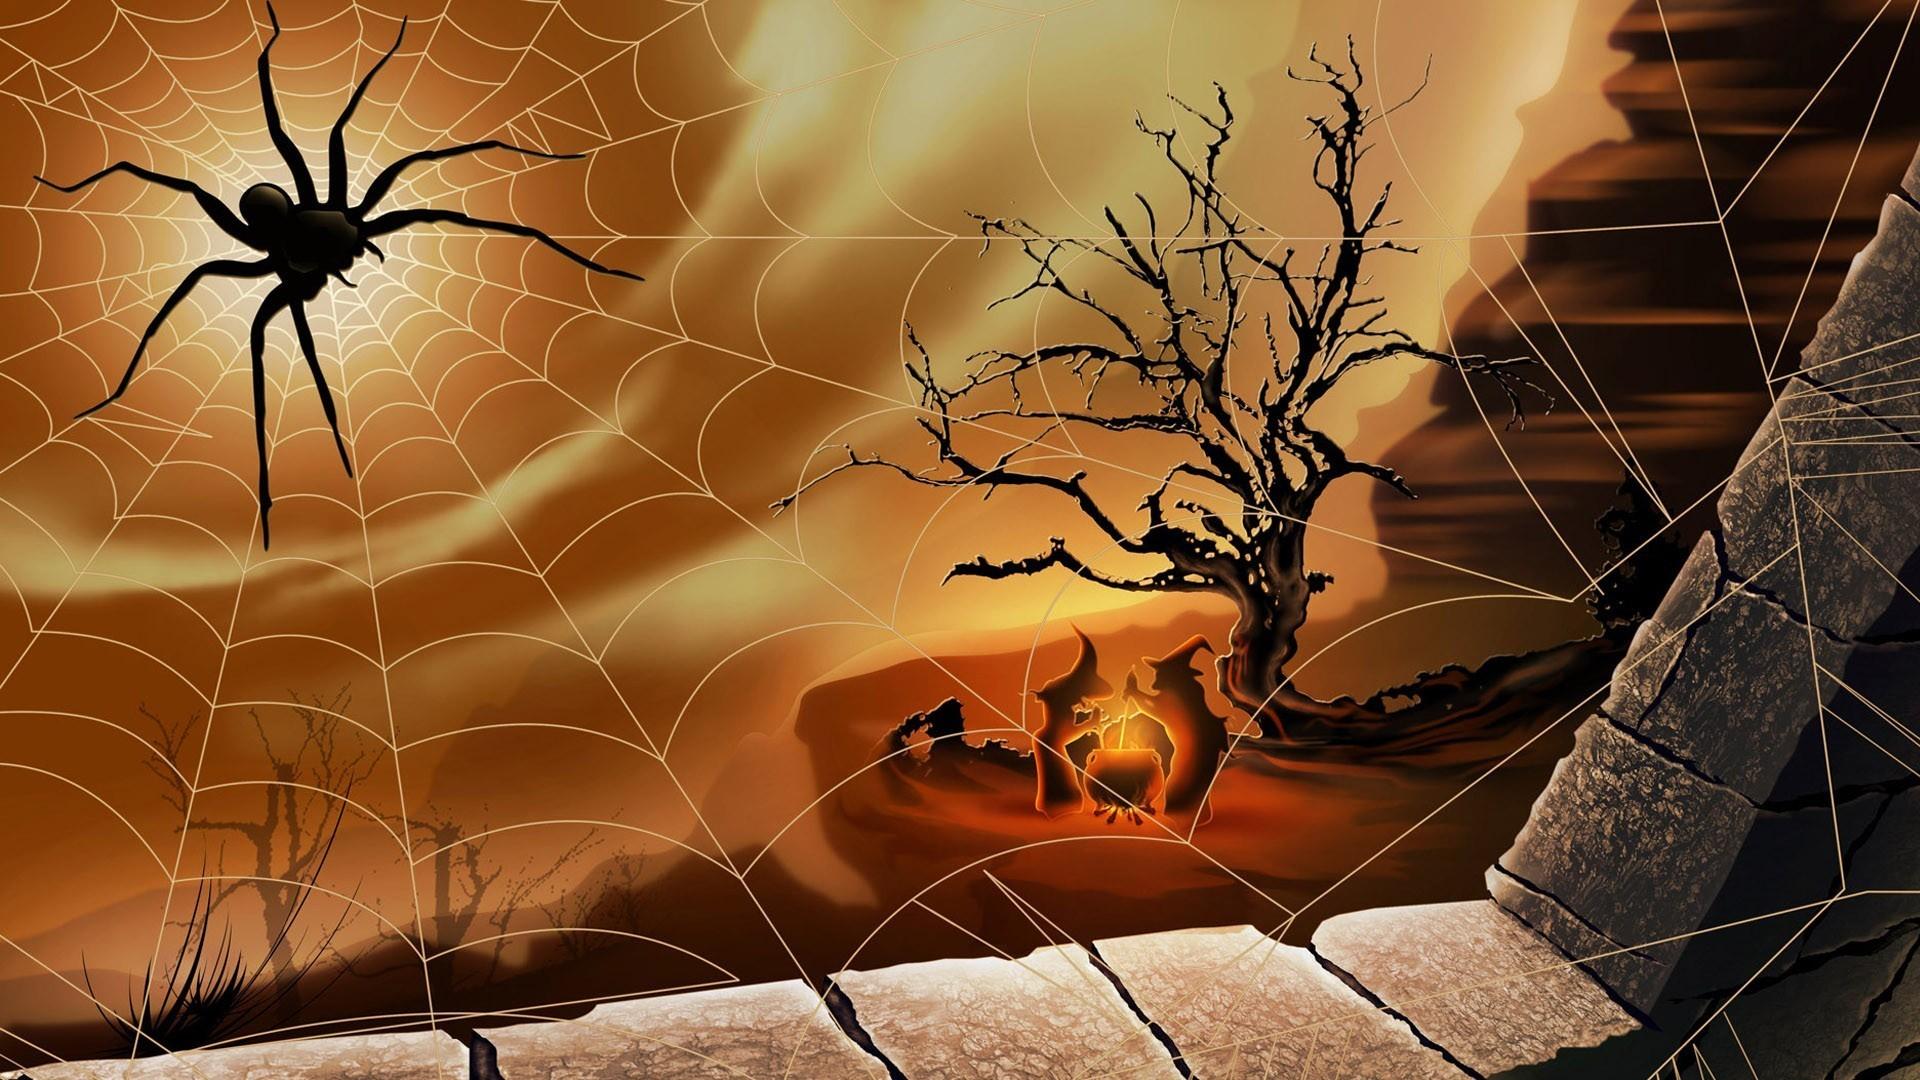 Wallpaper Trees Illustration Digital Art Window Rock Nature Bricks Branch Fire Cliff Witch Spiderwebs Spider Boiler Art Autumn Screenshot Computer Wallpaper Invertebrate 1920x1080 Redline 103617 Hd Wallpapers Wallhere